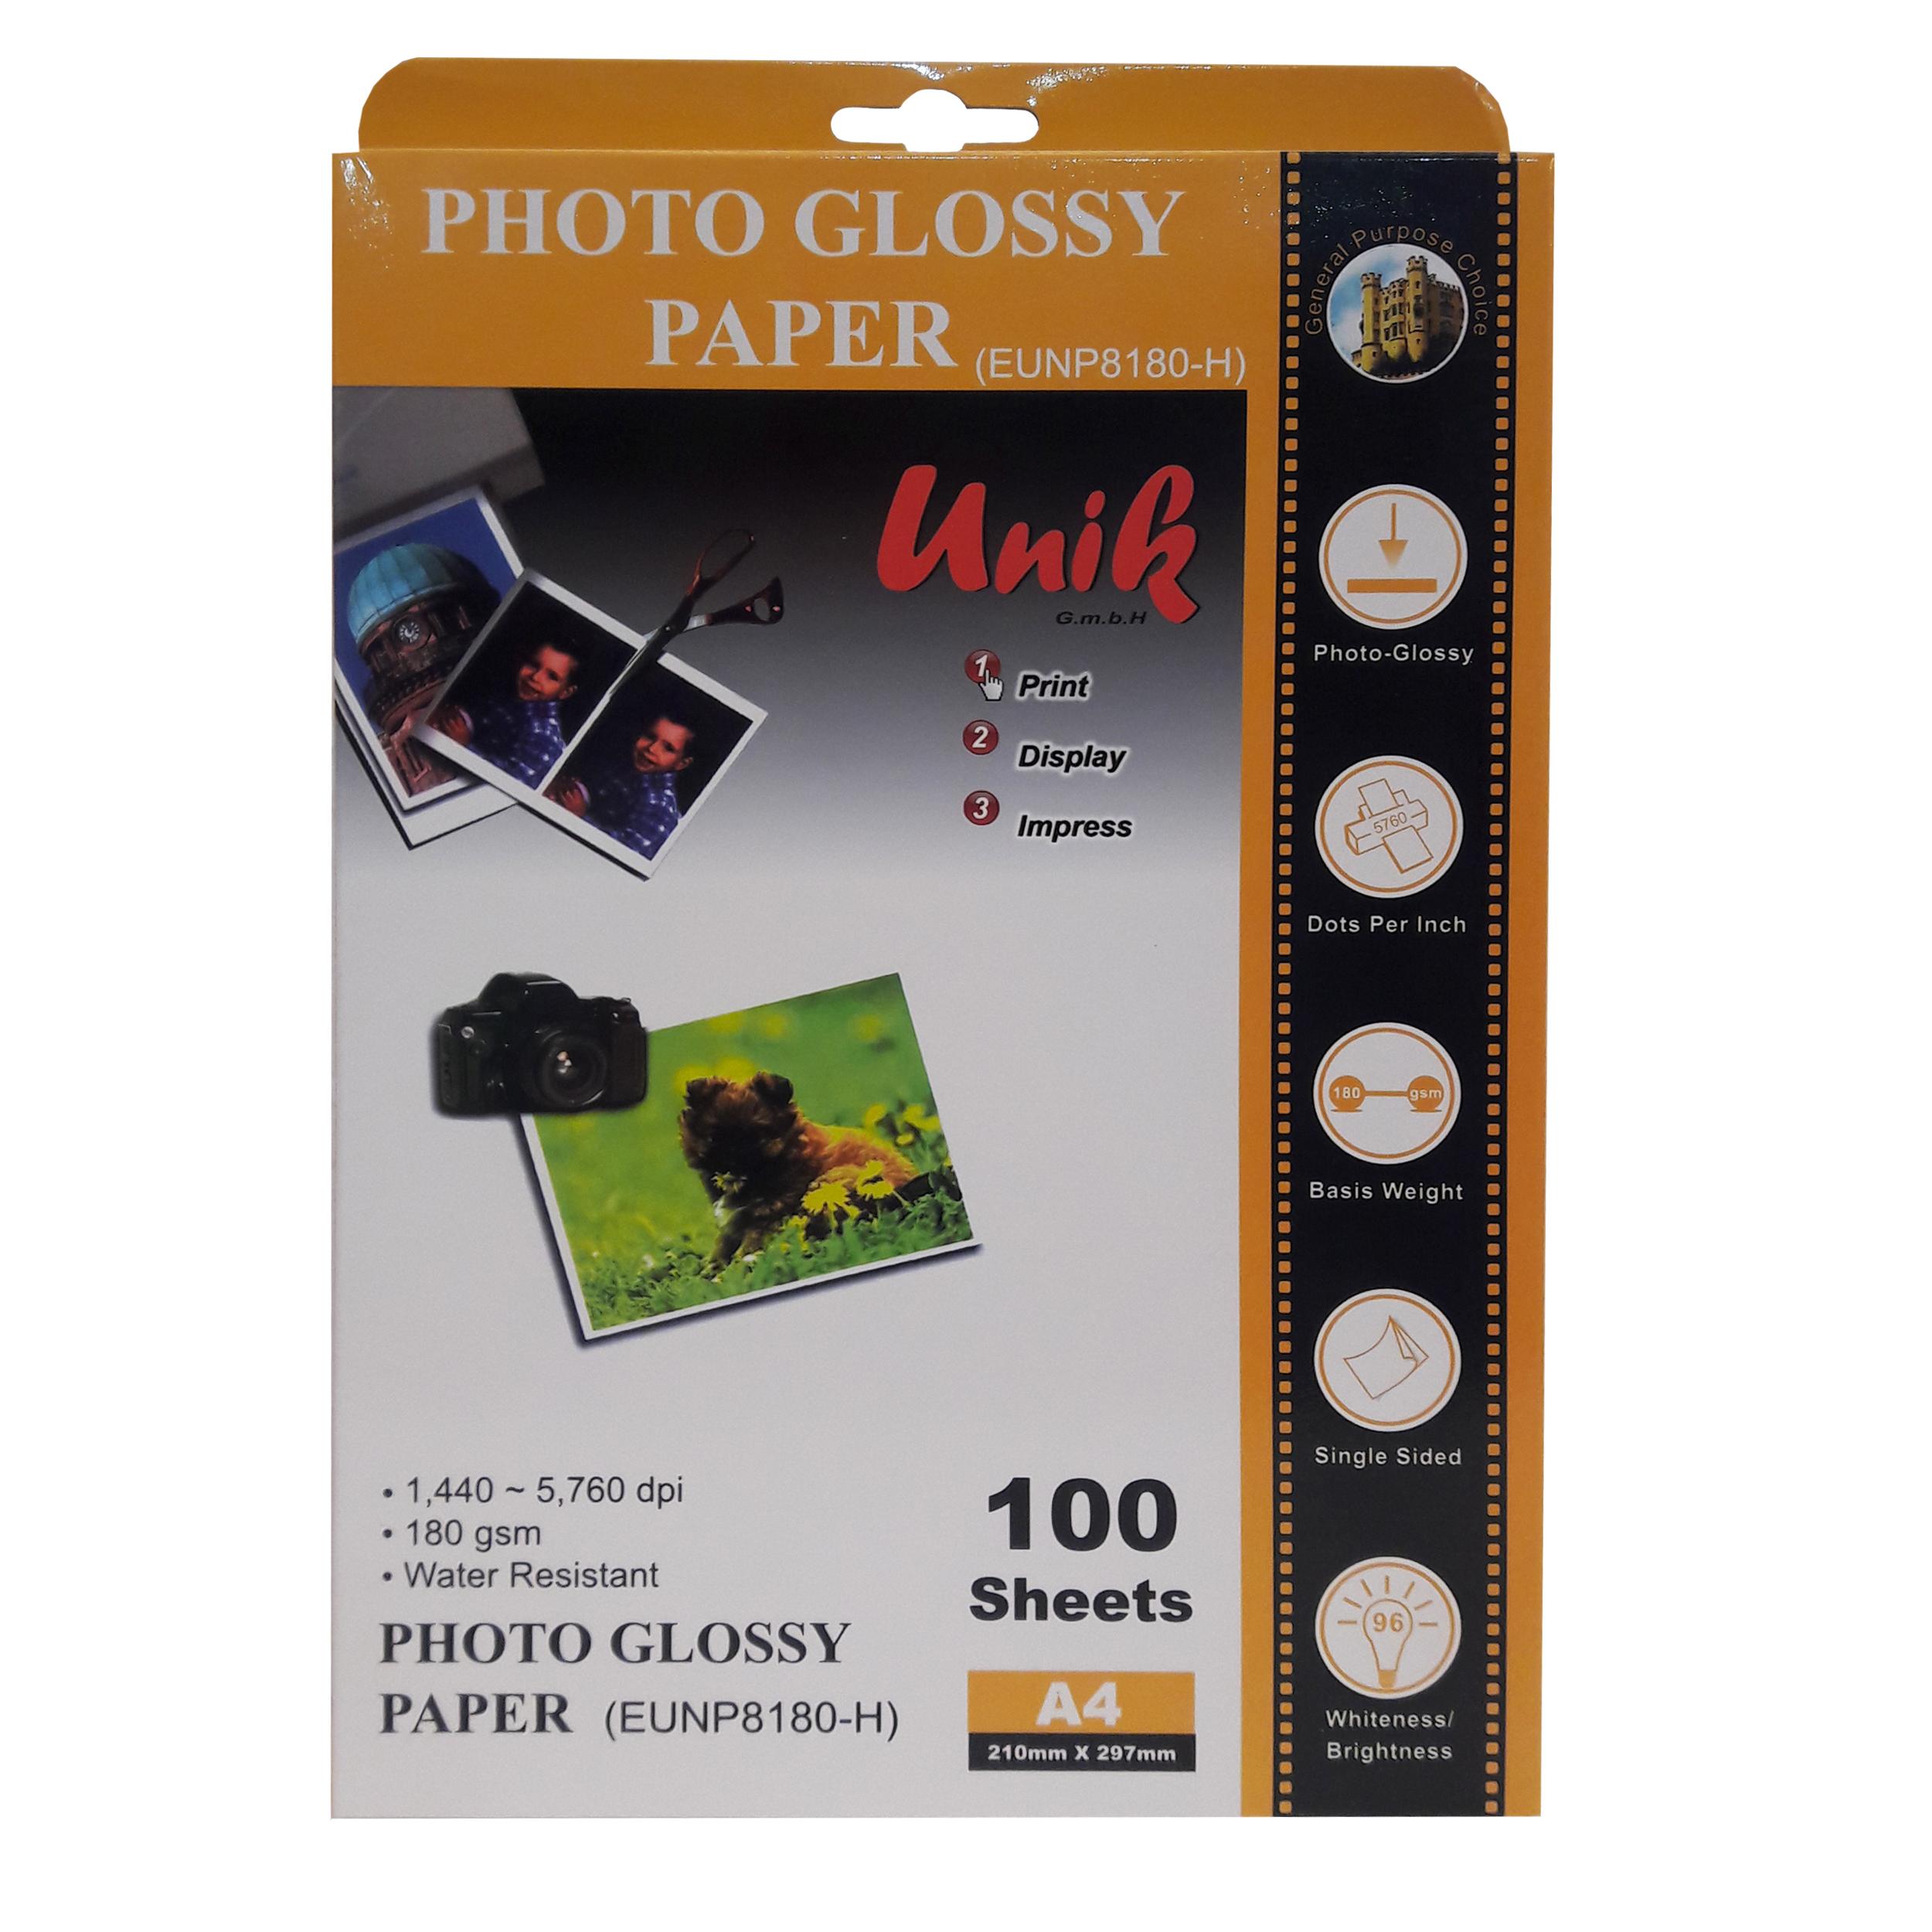 کاغذ چاپ عکس فتو گلاسه یونیک مدل EUNP8180H سایز A4 بسته 100 عددی